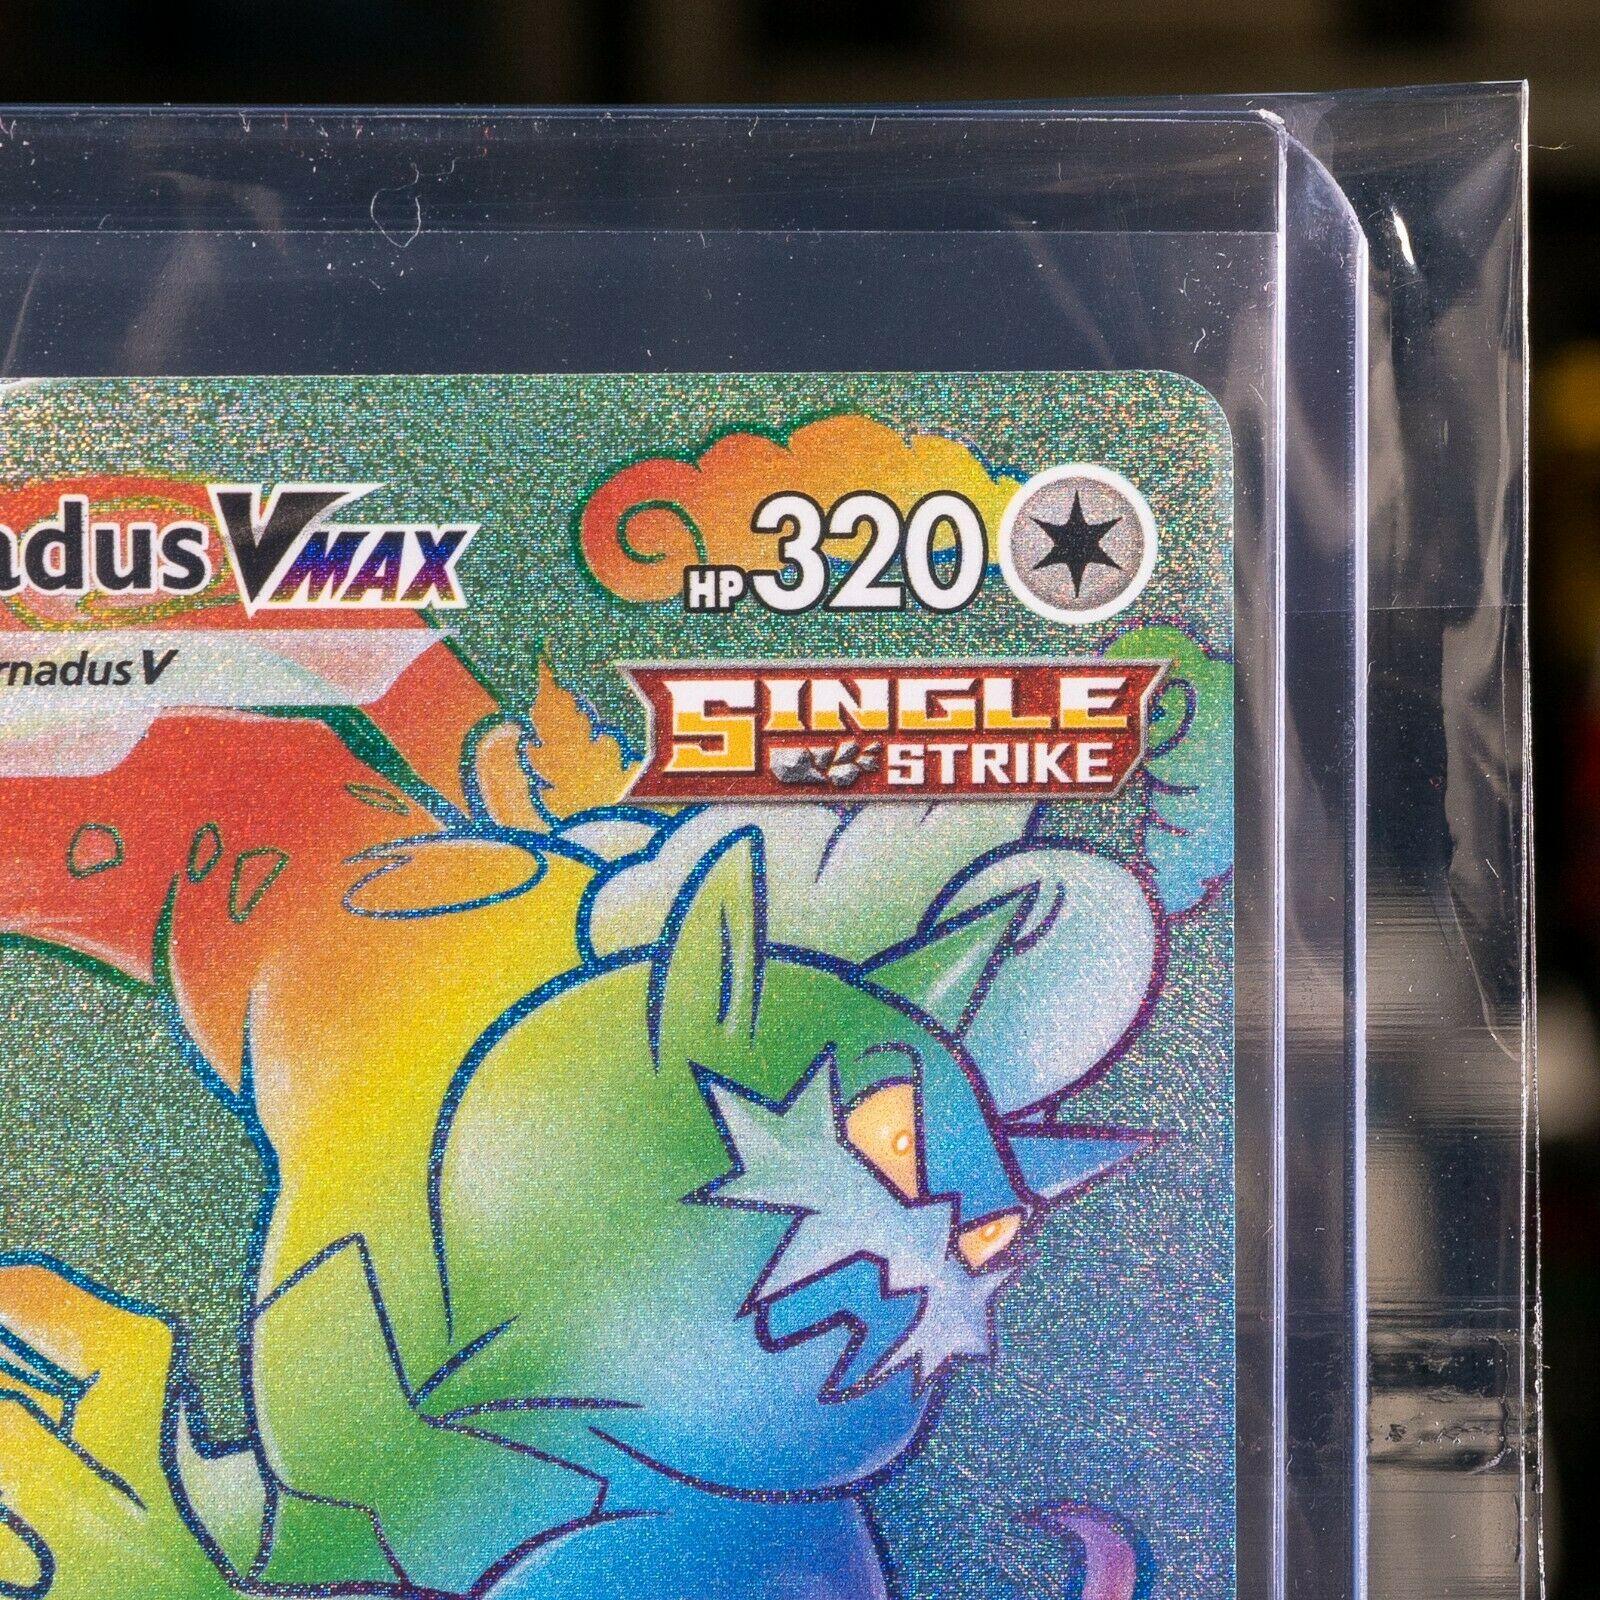 Tornadus VMAX - #209/198 - Secret Rainbow Rare Pokemon: Chilling Reign - Image 3